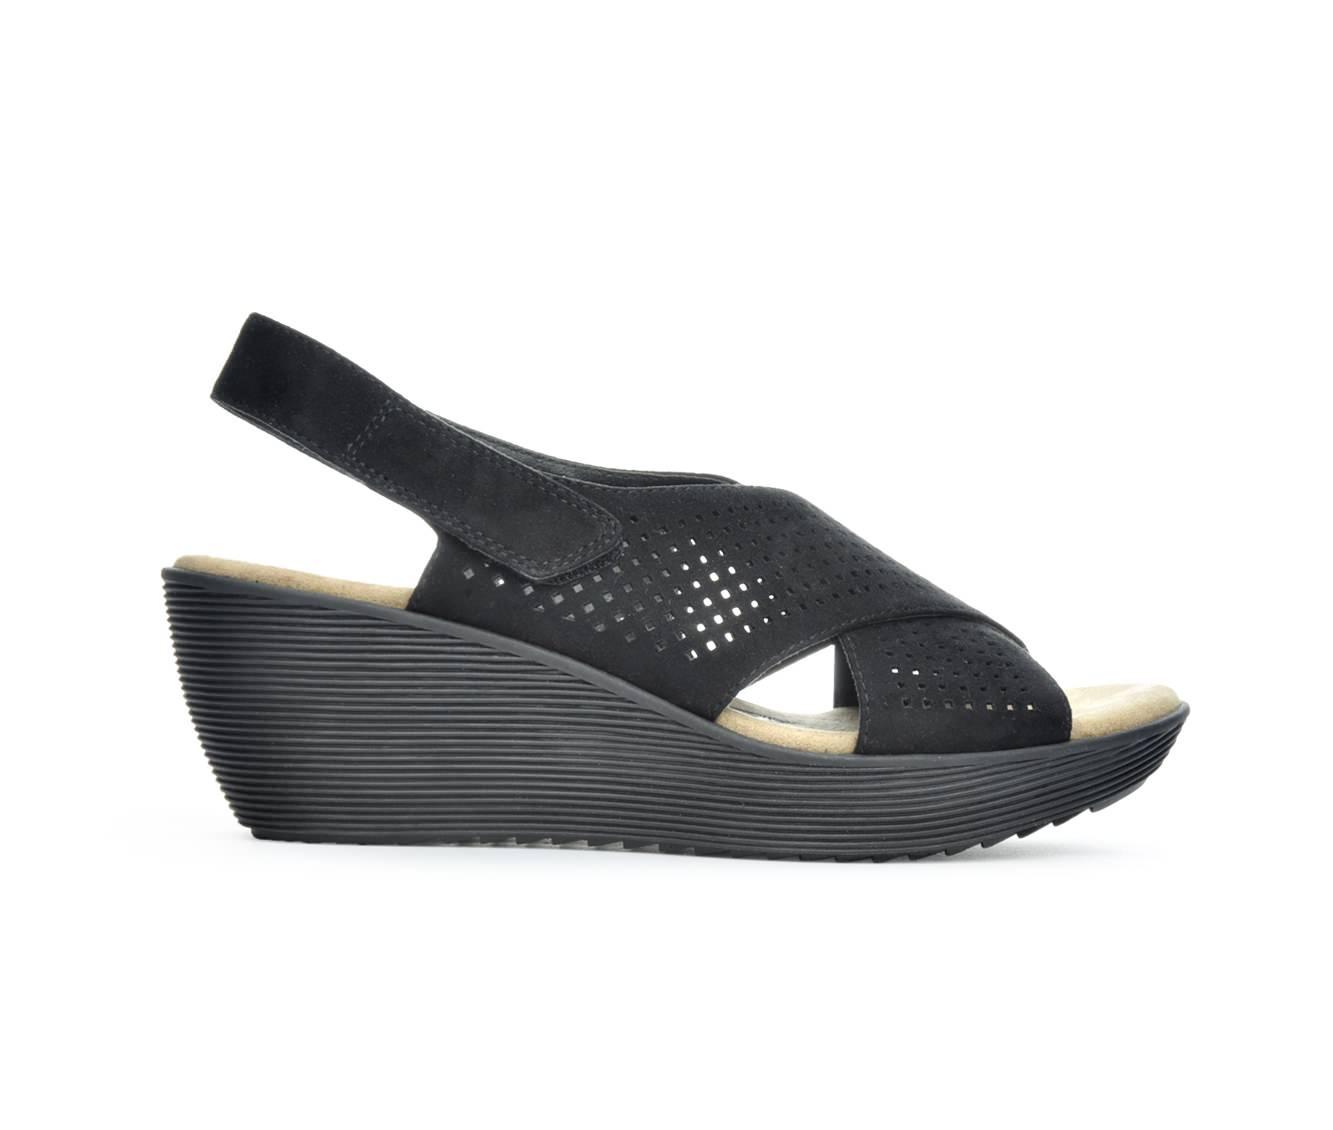 Women's Axxiom Tigris Wedge Sandals (Black)